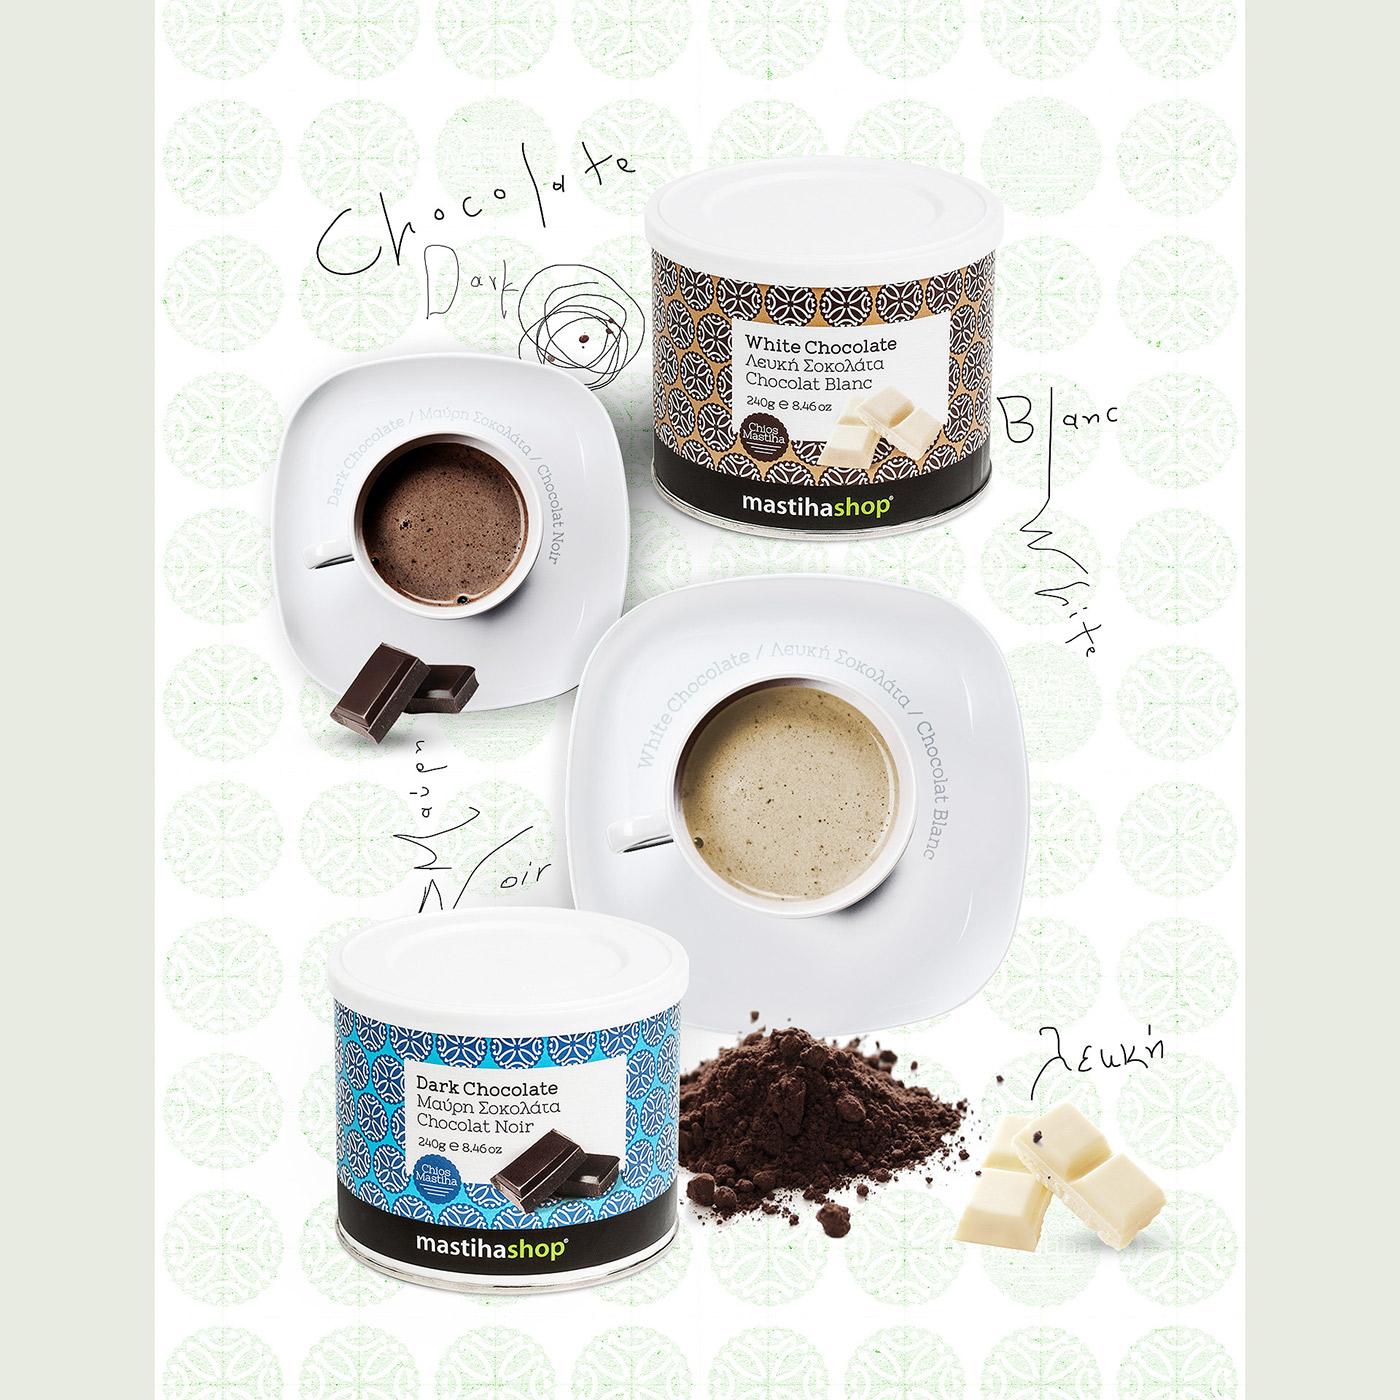 Mediterra SA www.mastihashop.com finest goods mediterranean Chios beverage dark chocolate white chocolate pattern product series